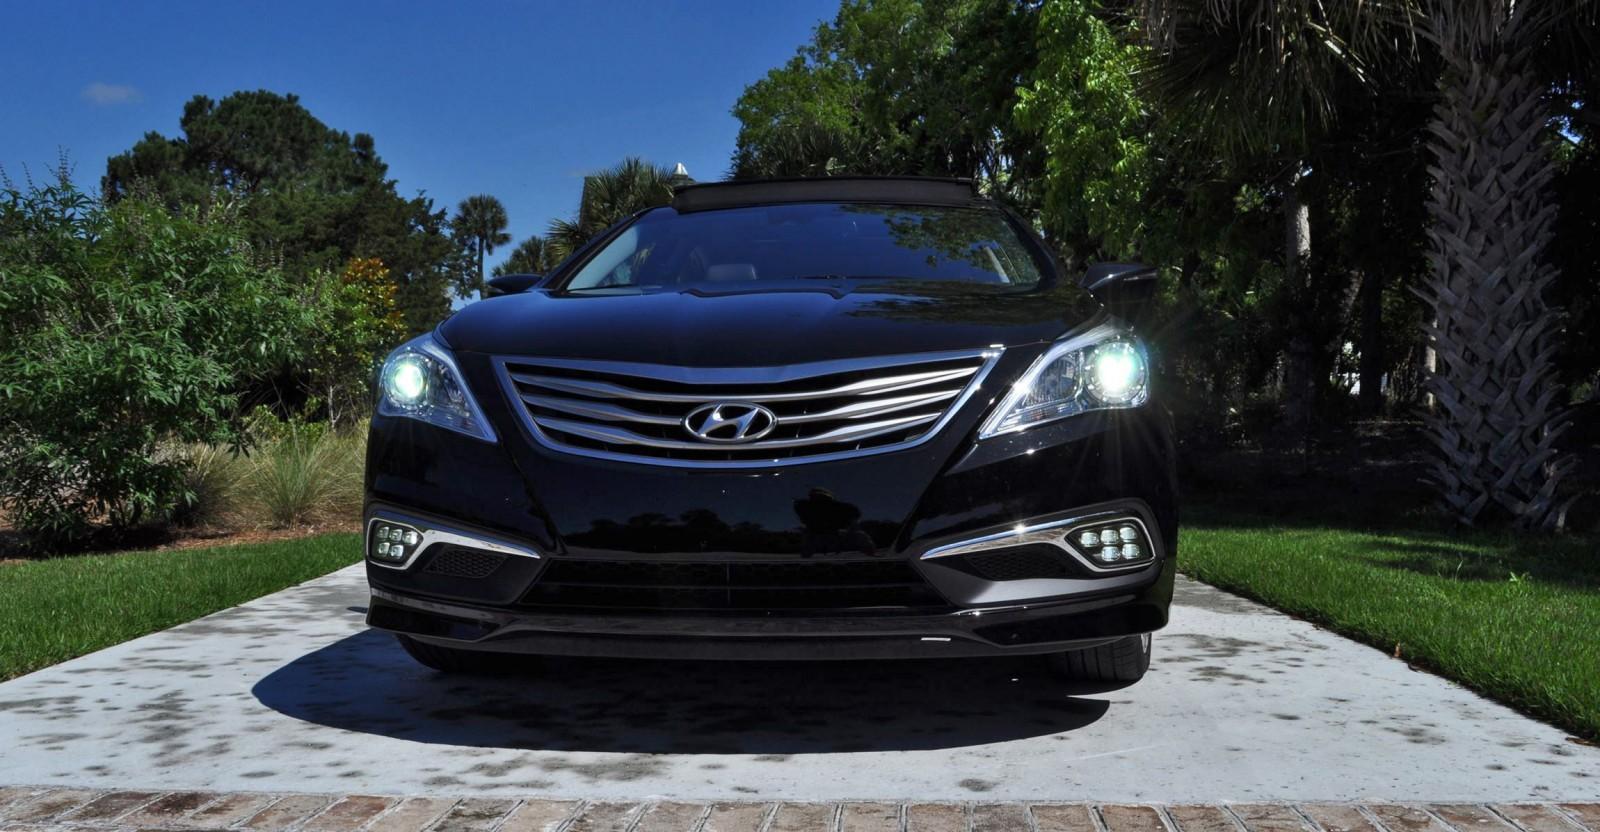 Road Test Review - 2015 Hyundai AZERA Limited 80